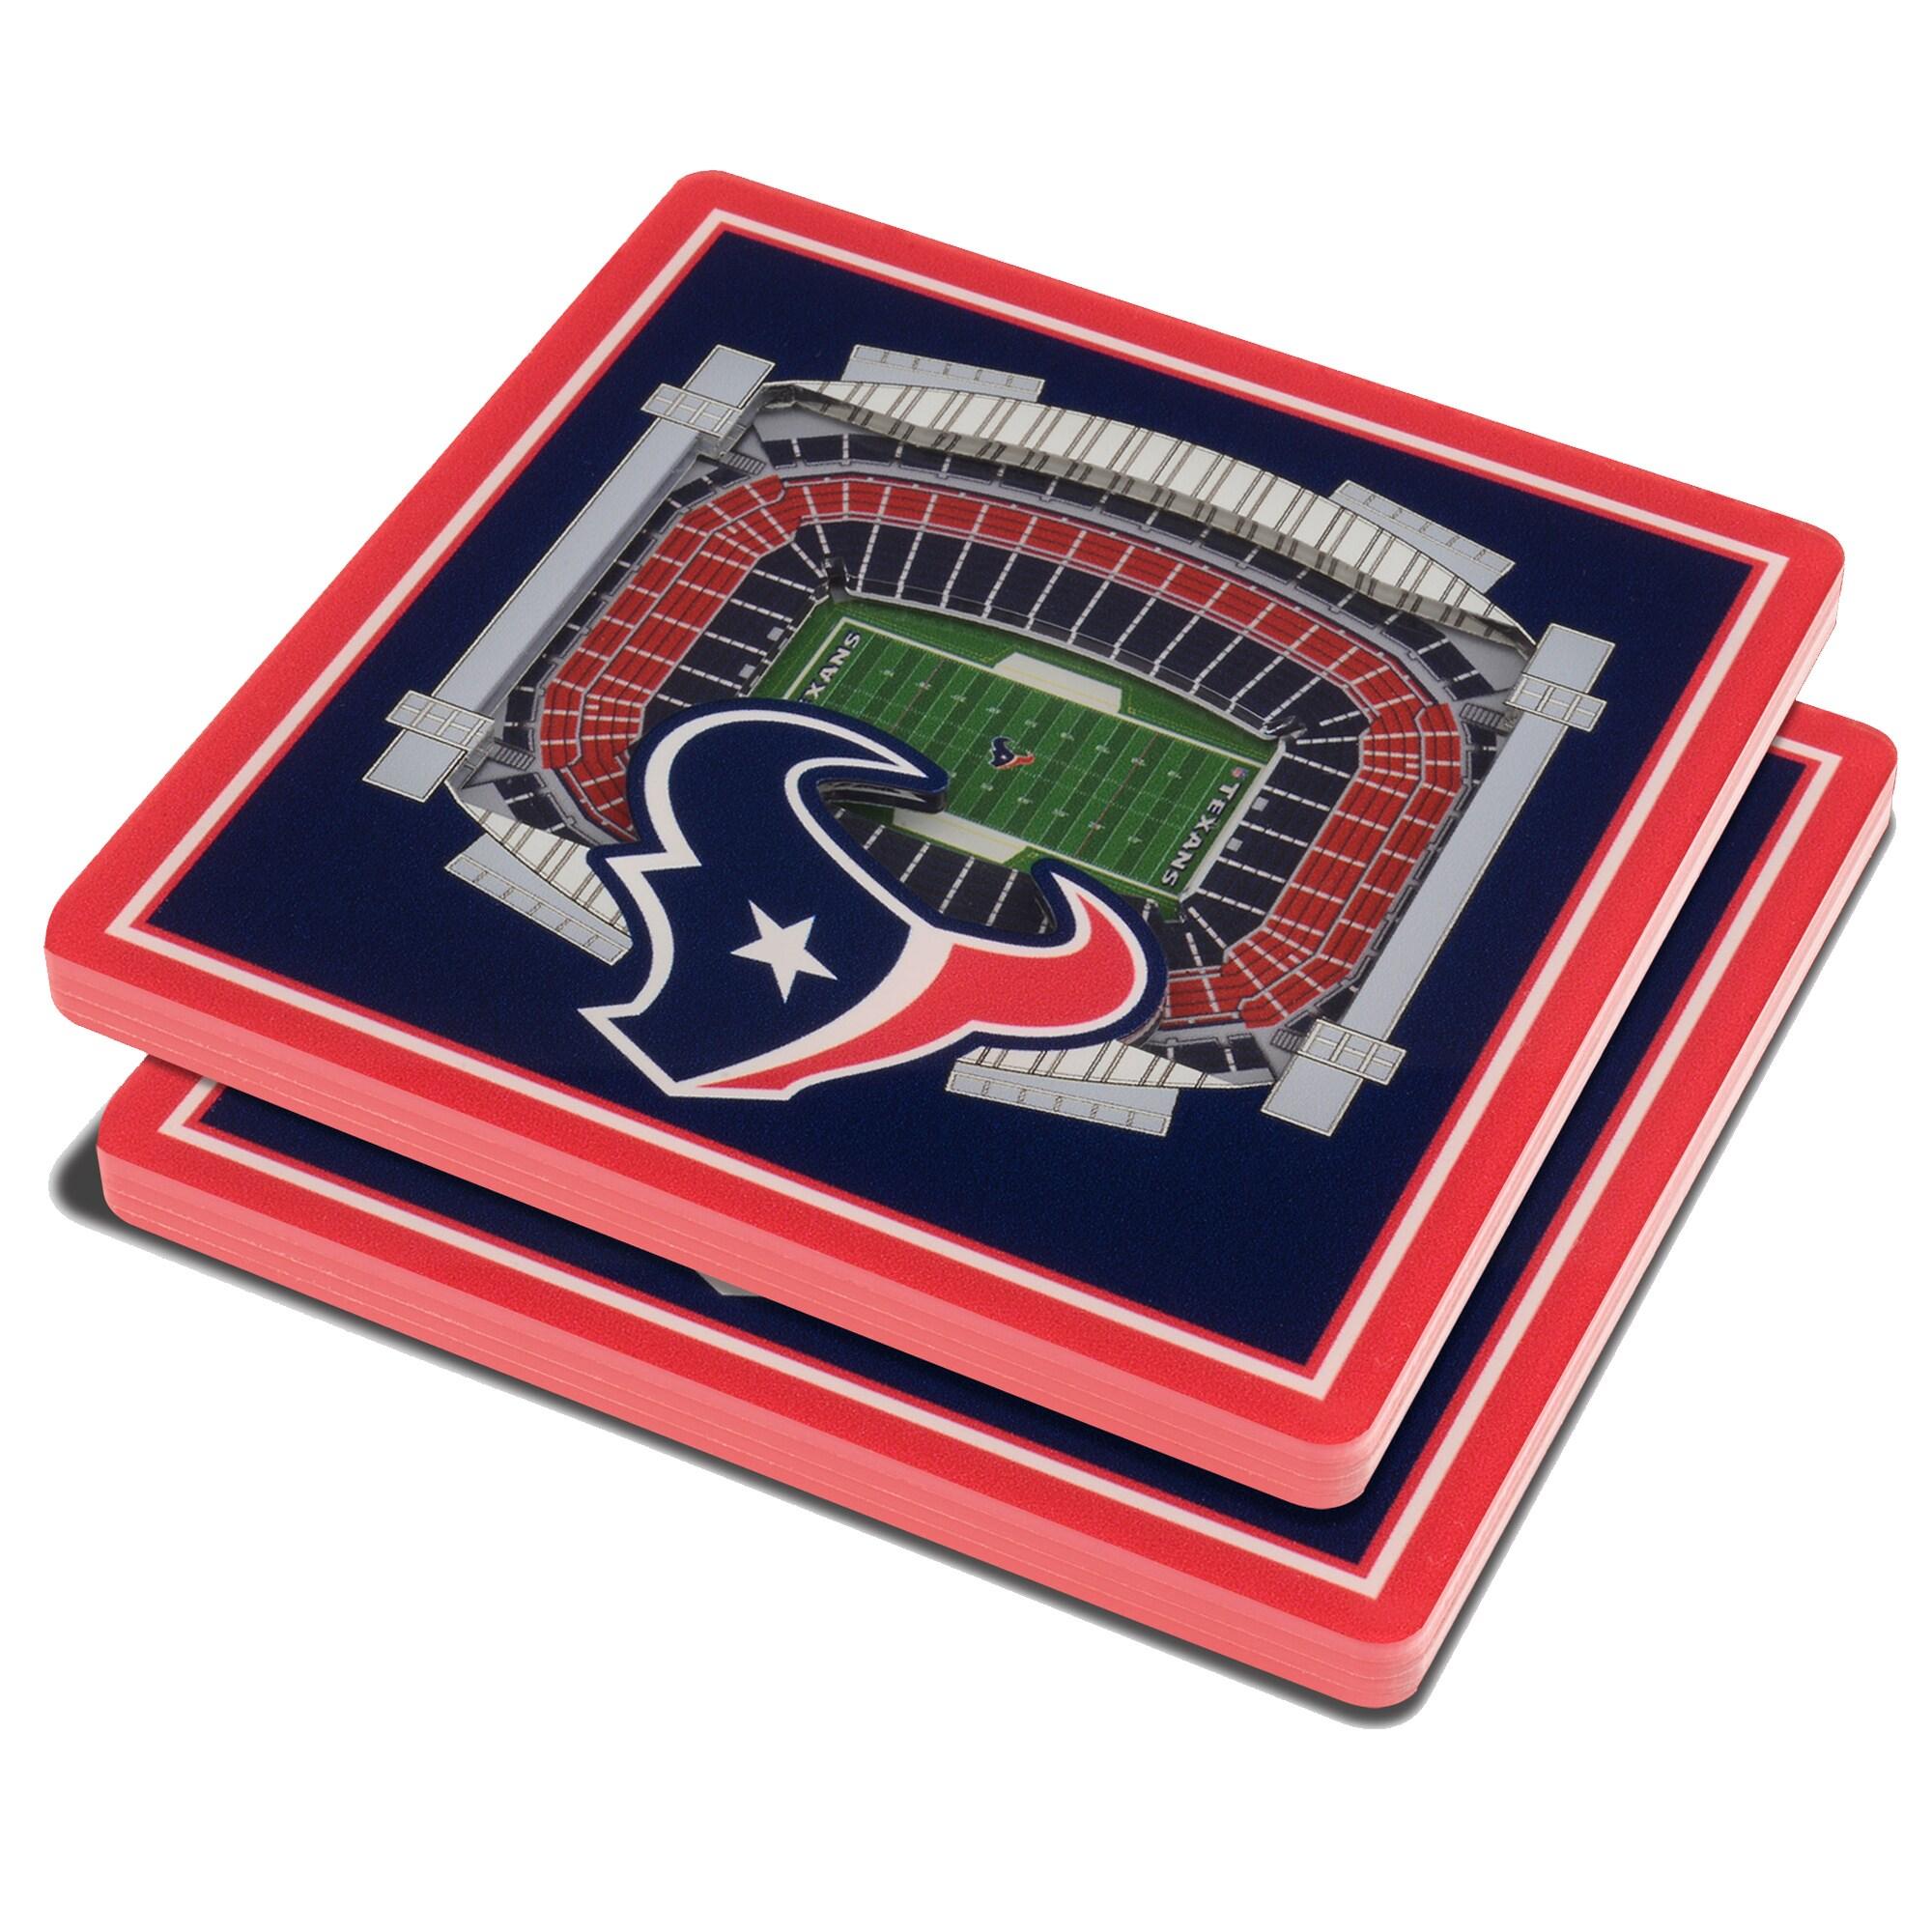 Houston Texans 3D StadiumViews Coasters - Blue